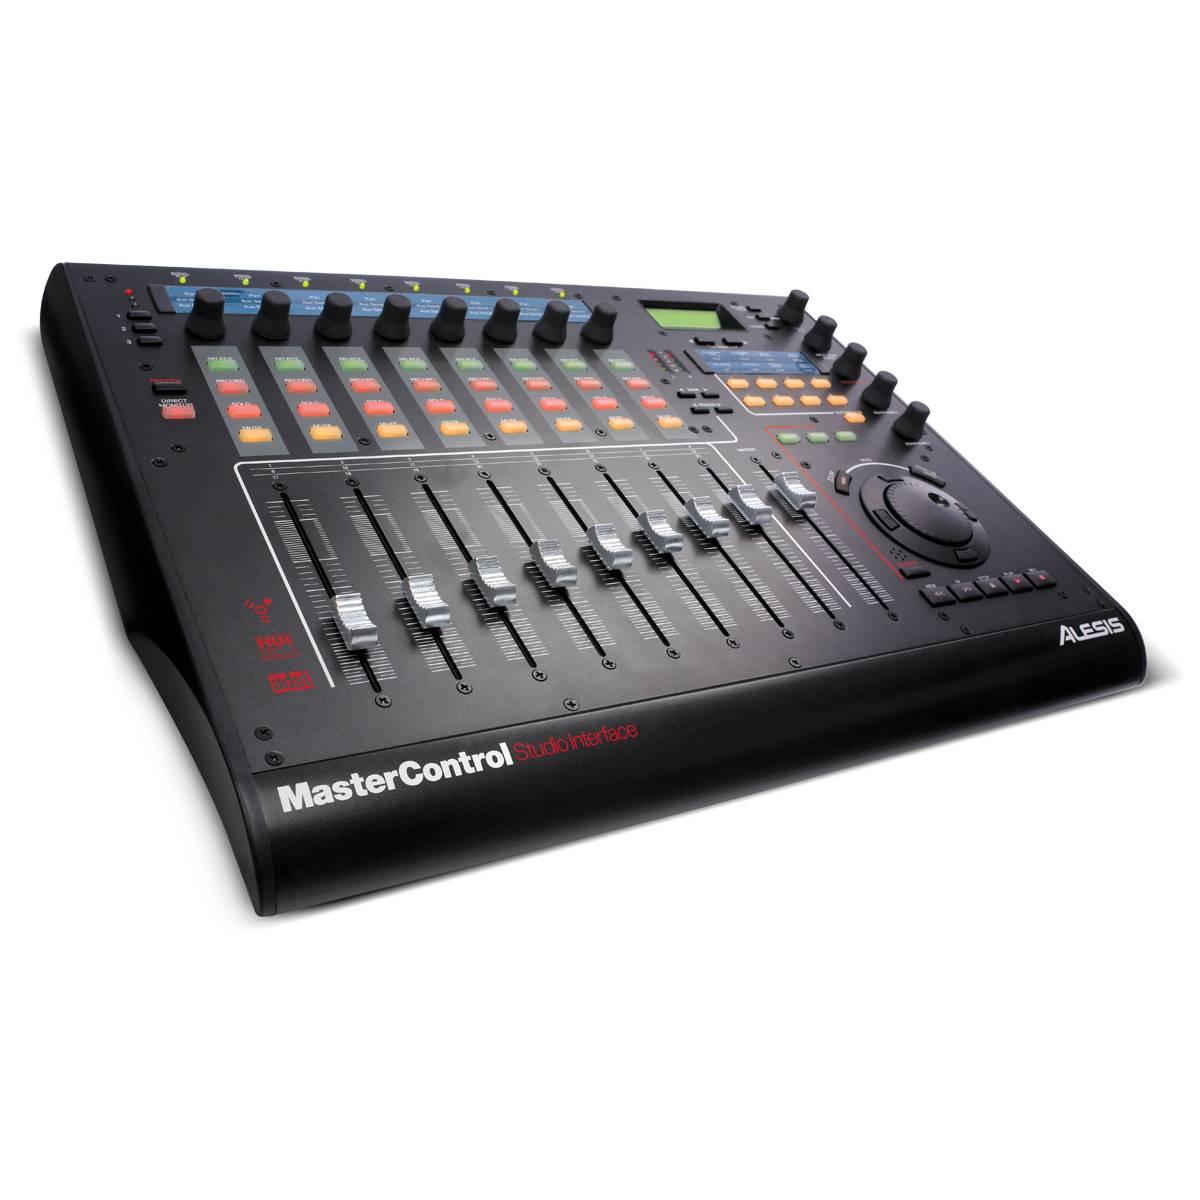 Alesis MasterControl Control Surface Audio Studio Interface NOT WORKING